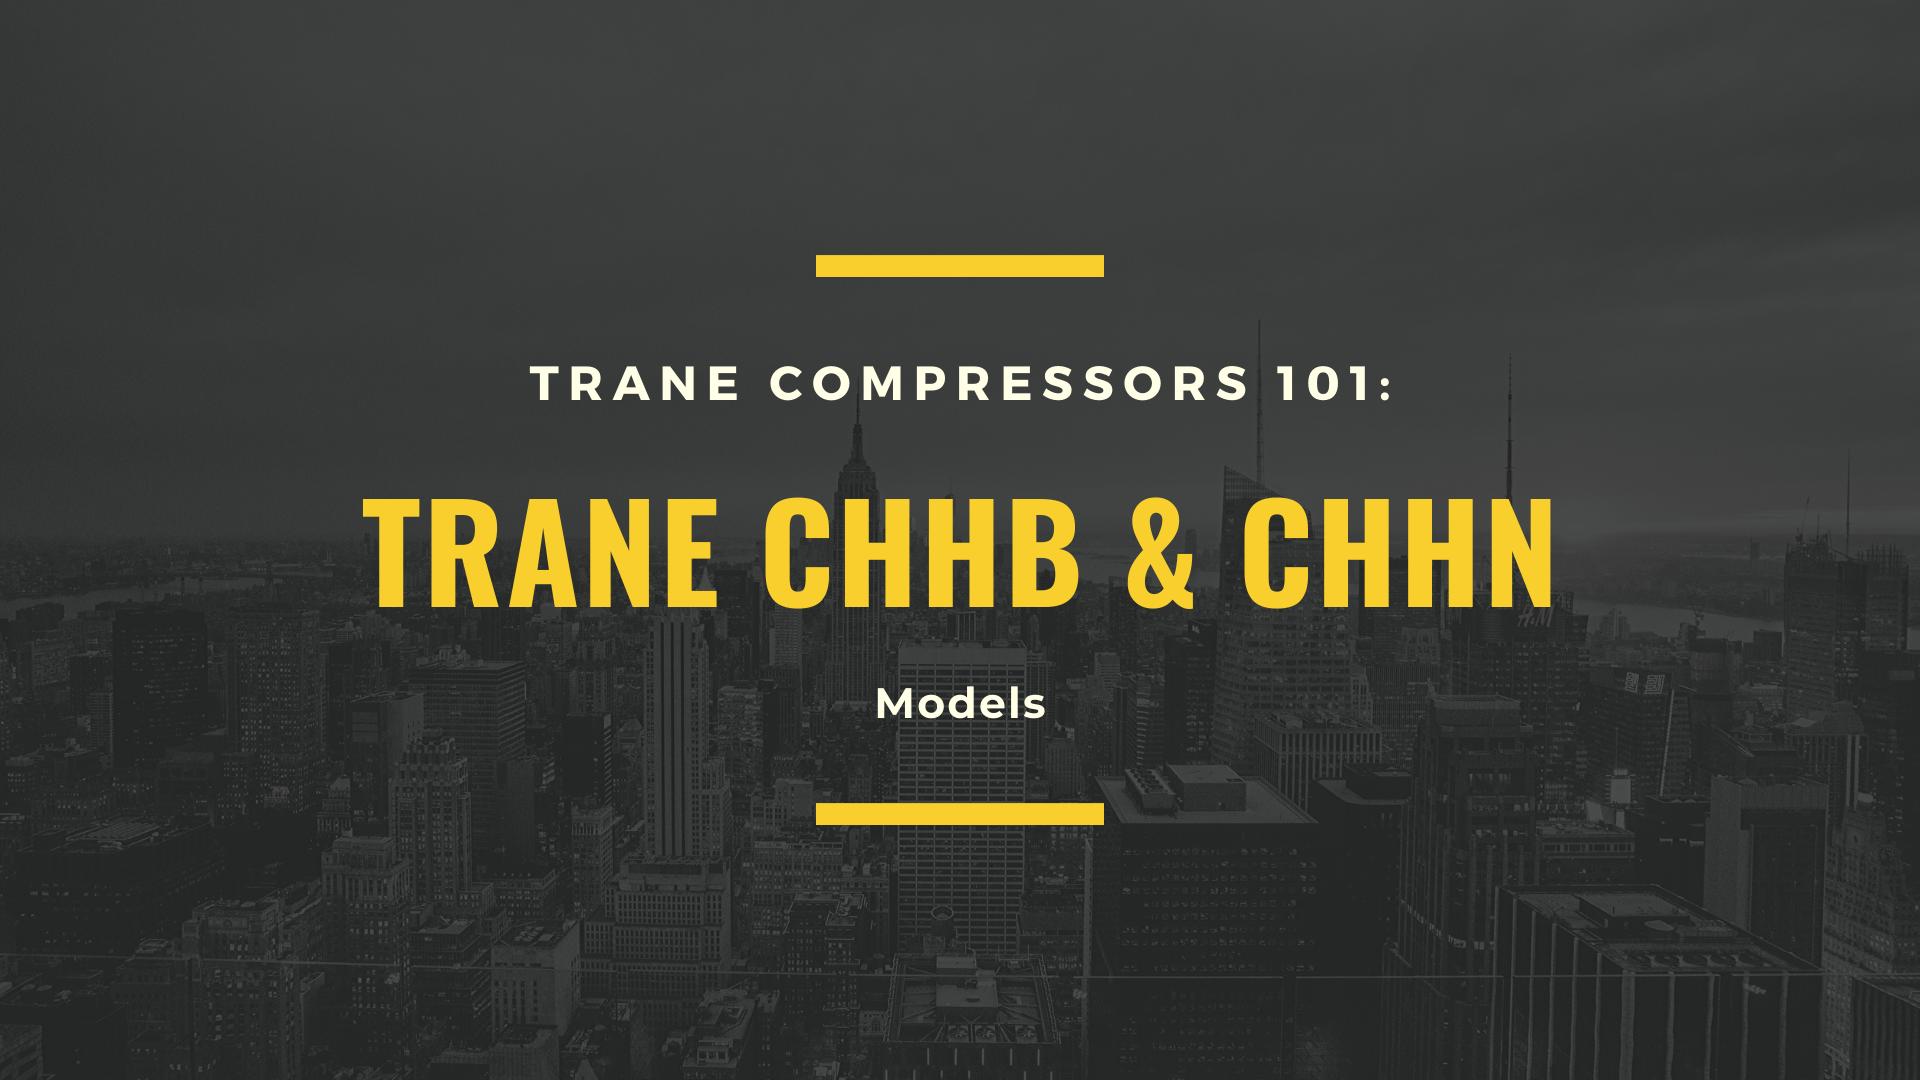 Trane Commercial Compressor CHHB CHHN